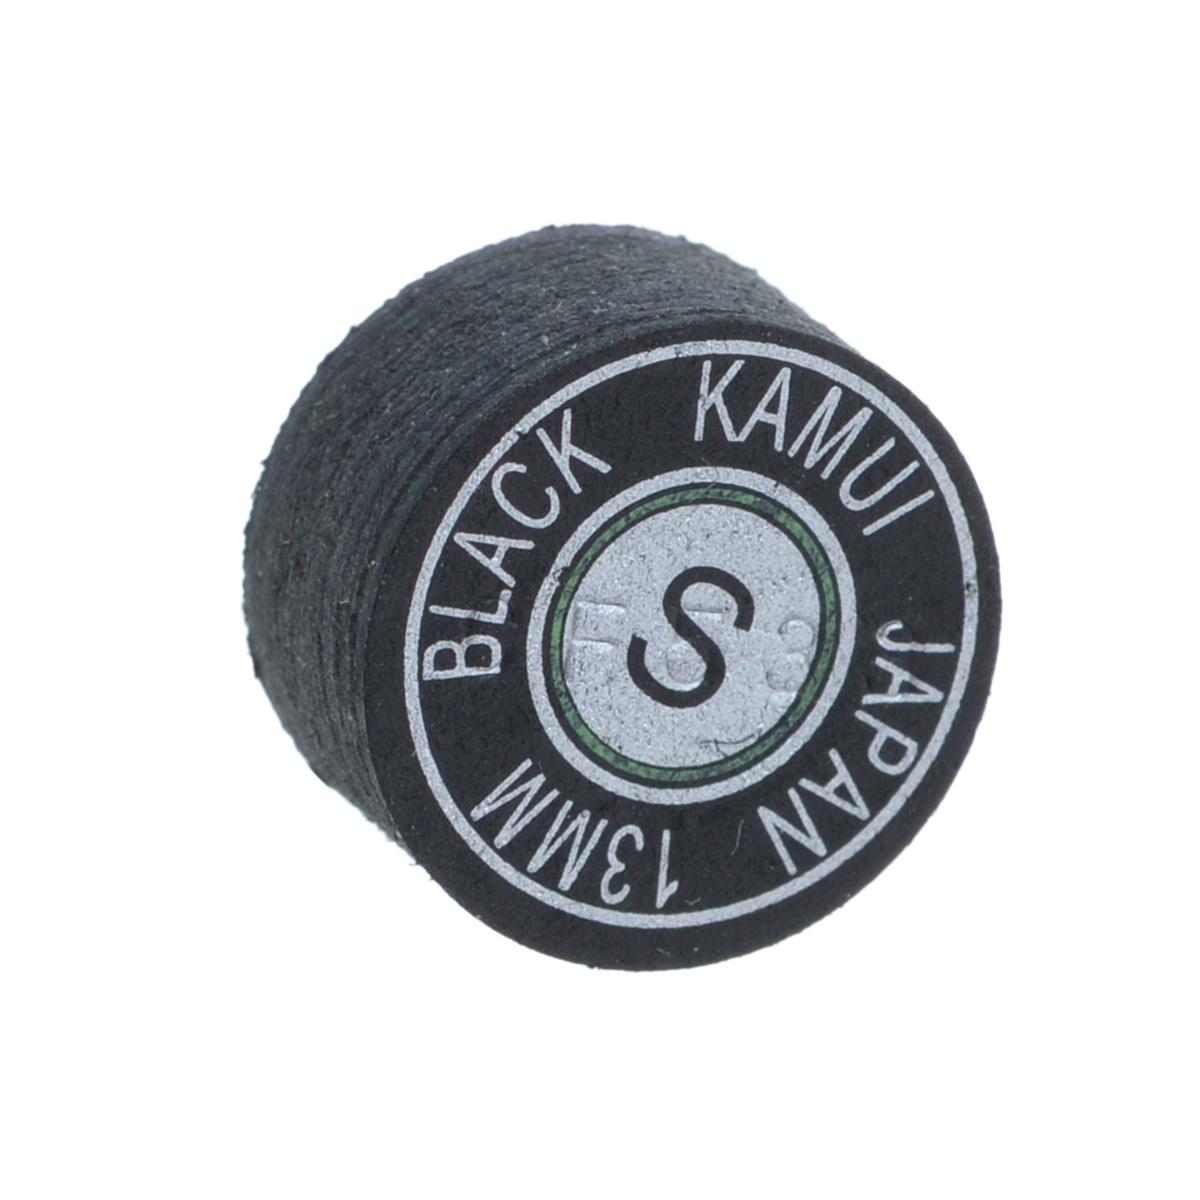 Наклейка для кия Kamui  Black , мягкая, 13 мм - Бильярд